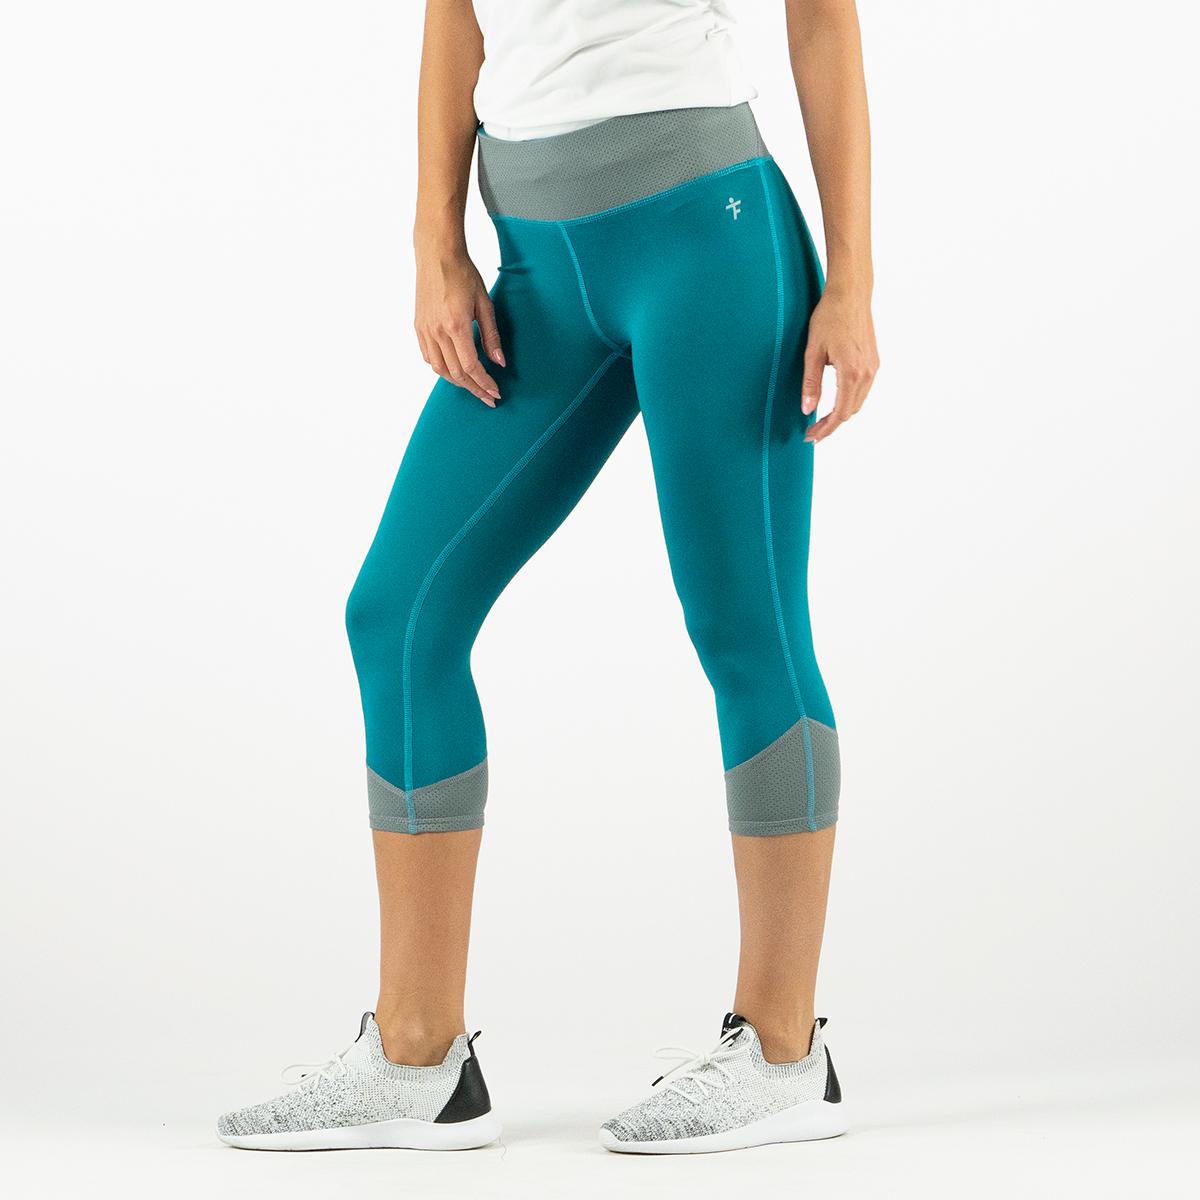 b7b9b945a60154 Tru Fit Women's Fitness Capri Leggings w/ Mesh Waistband Teal/Grey ...